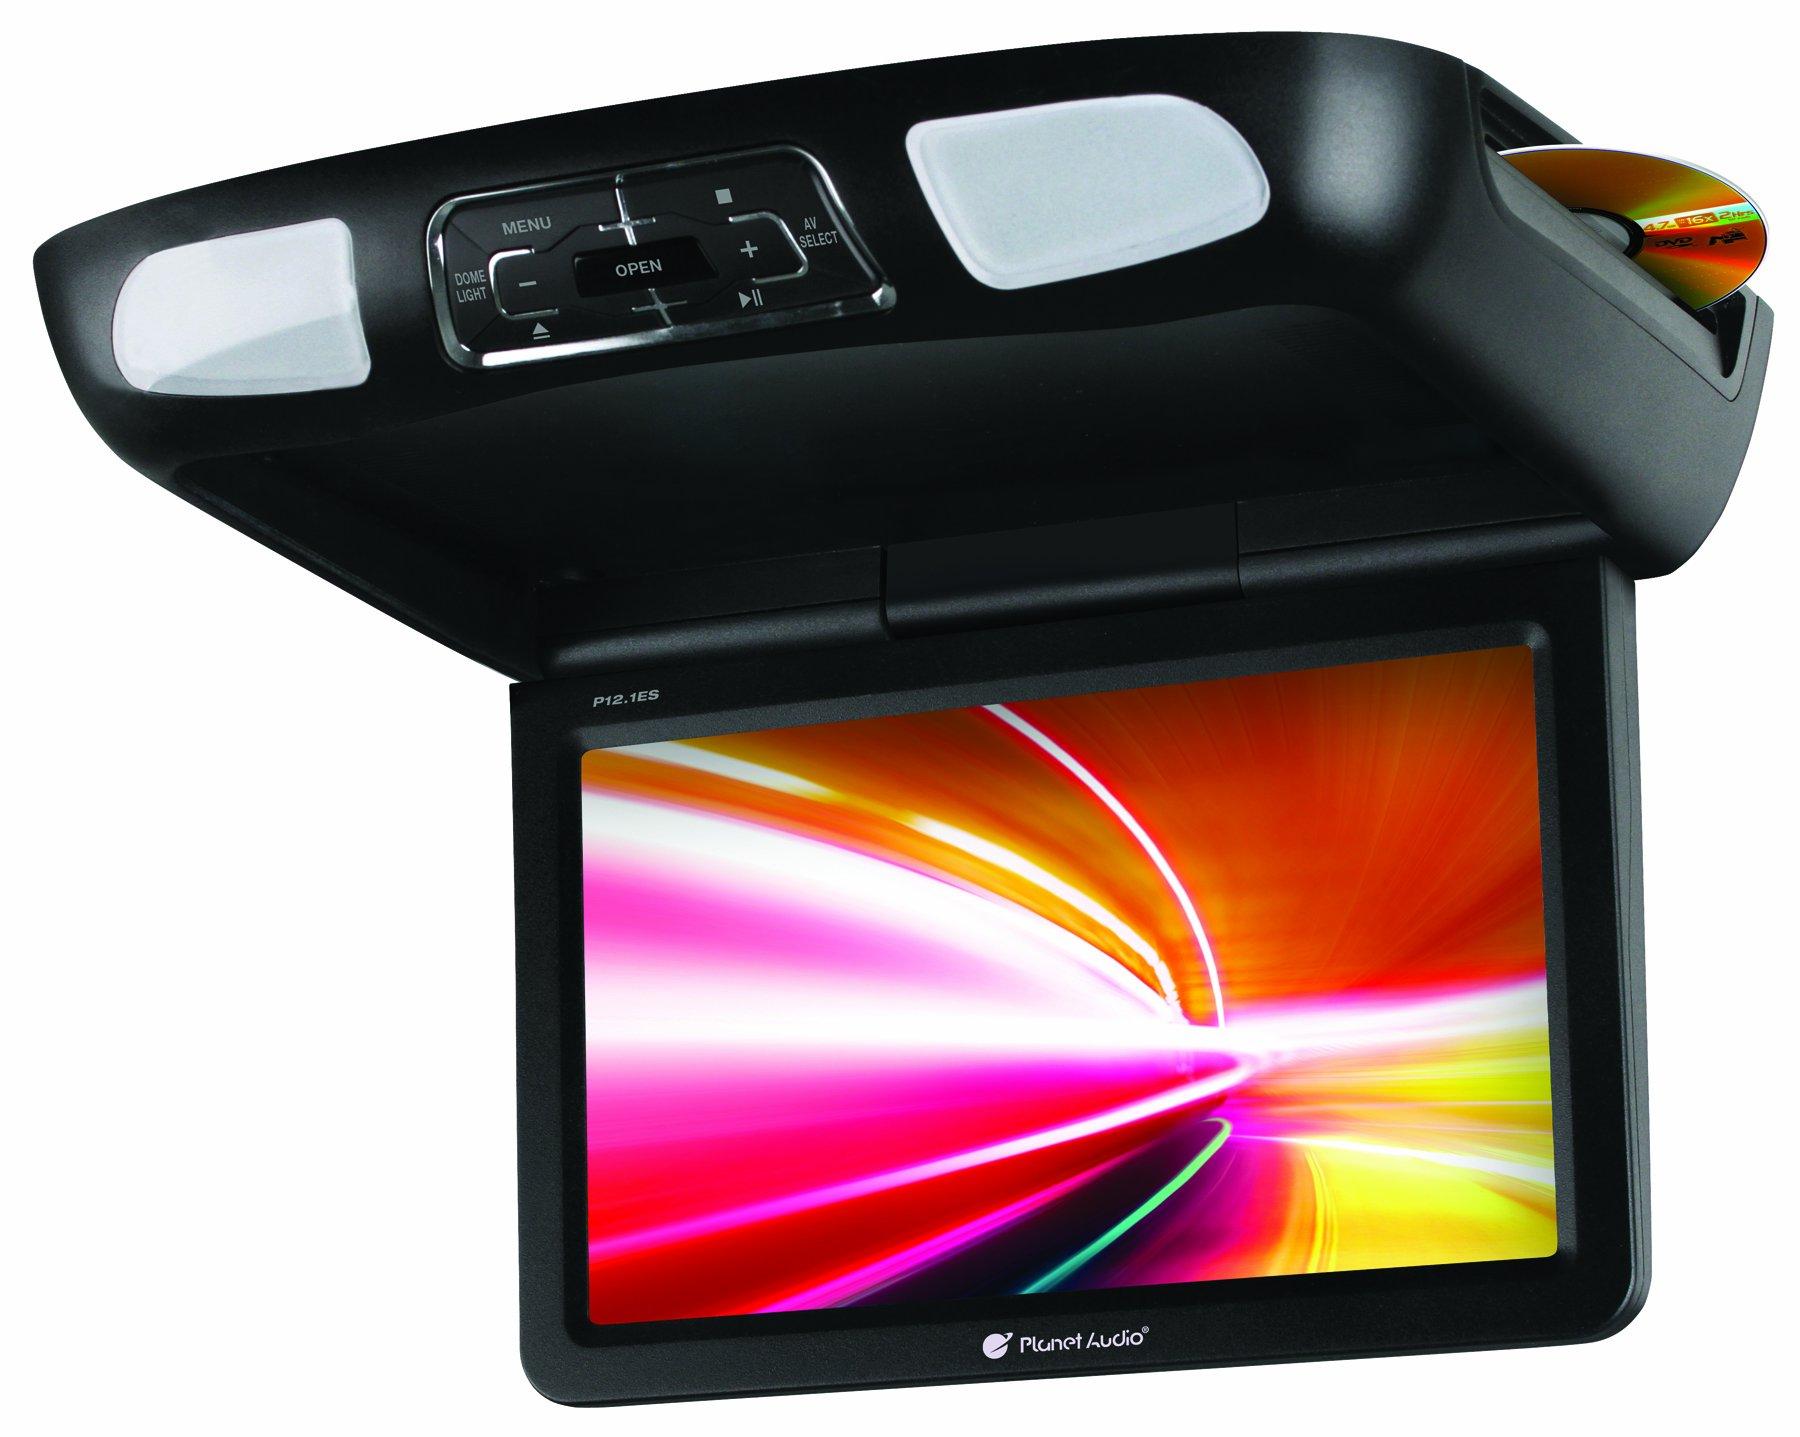 PLANET AUDIO P10.1ES Black/Grey/Tan 10.1'' Flip Down Car DVD Monitor+Headphones by Planet Audio